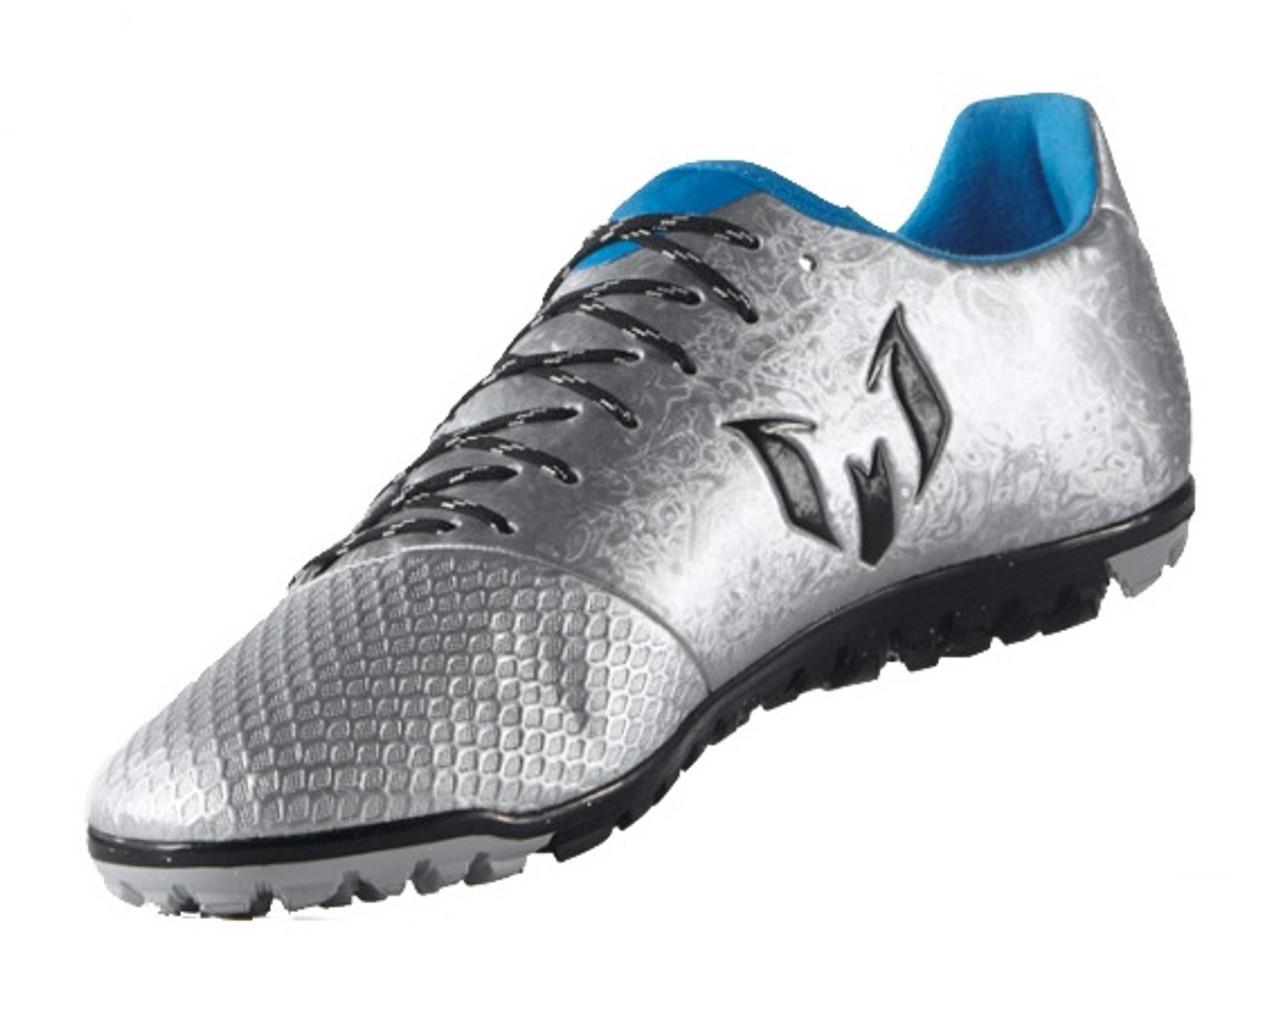 adidas Messi 16.3 TF - Silver Black Blue - ohp soccer 5668c6390